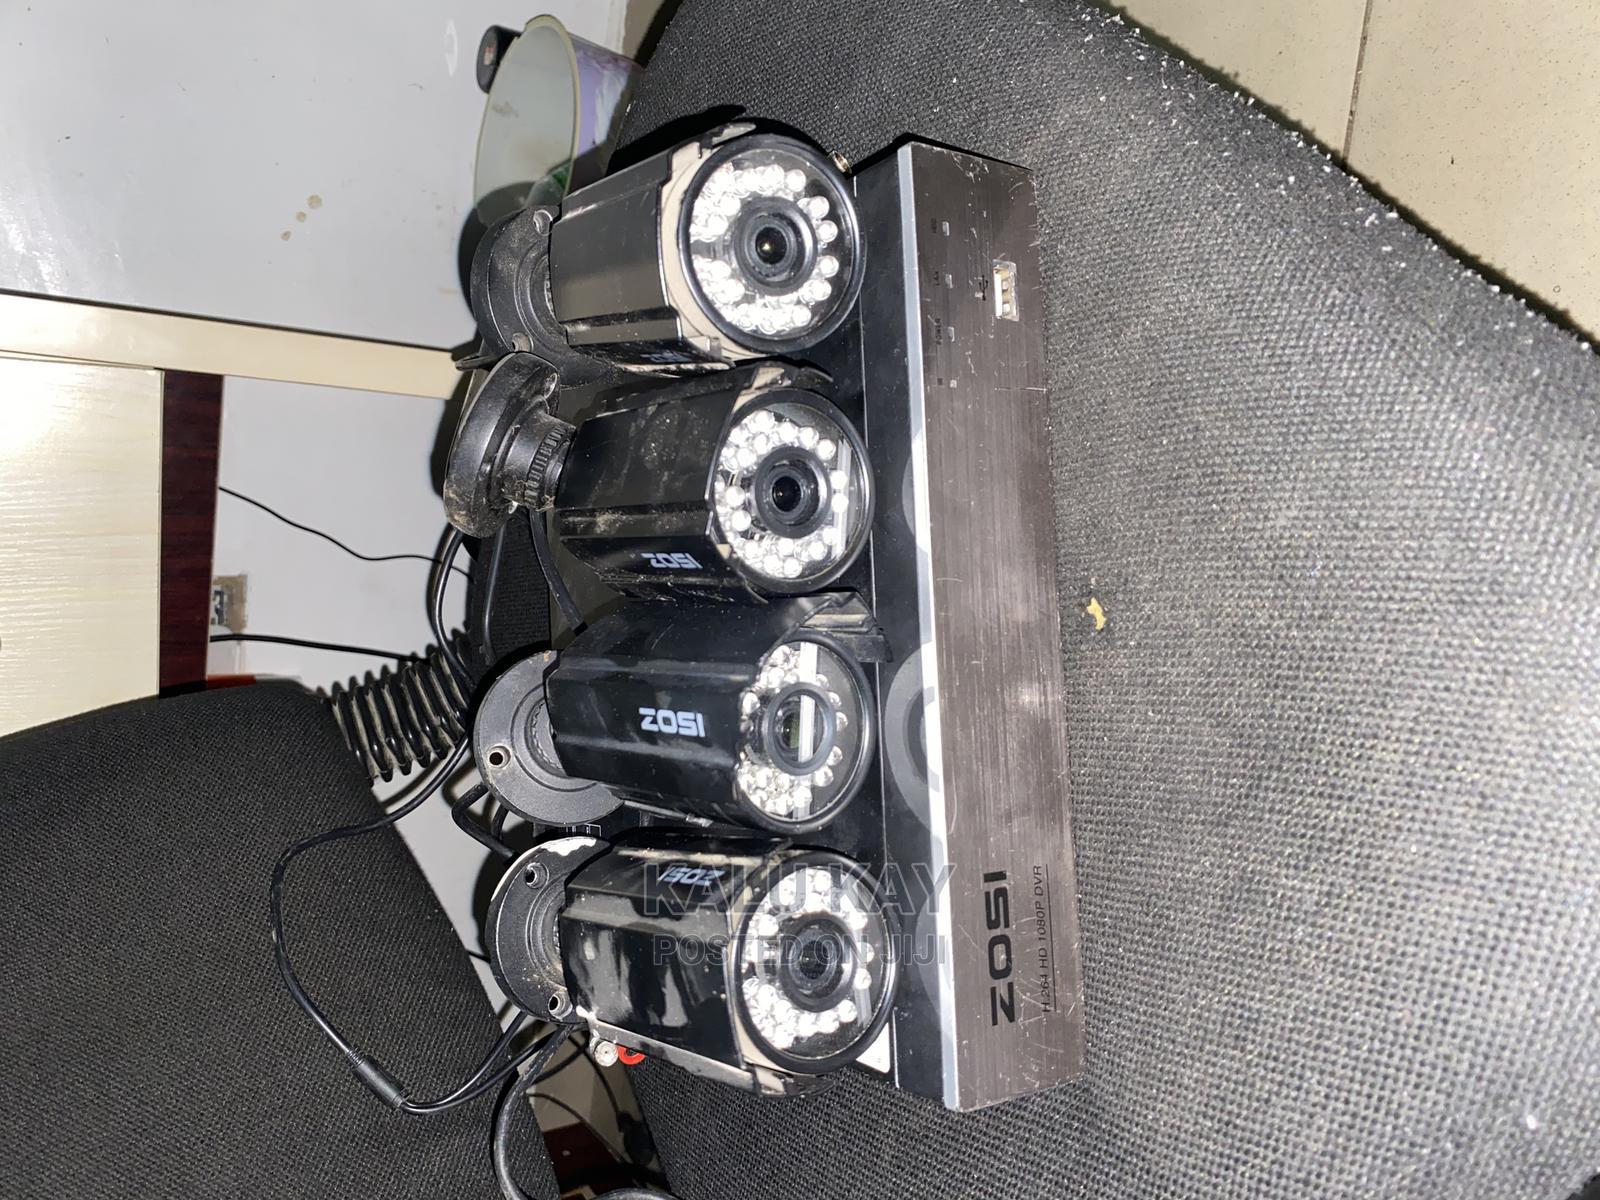 Archive: Zosi H.264 HD Cctv Camera